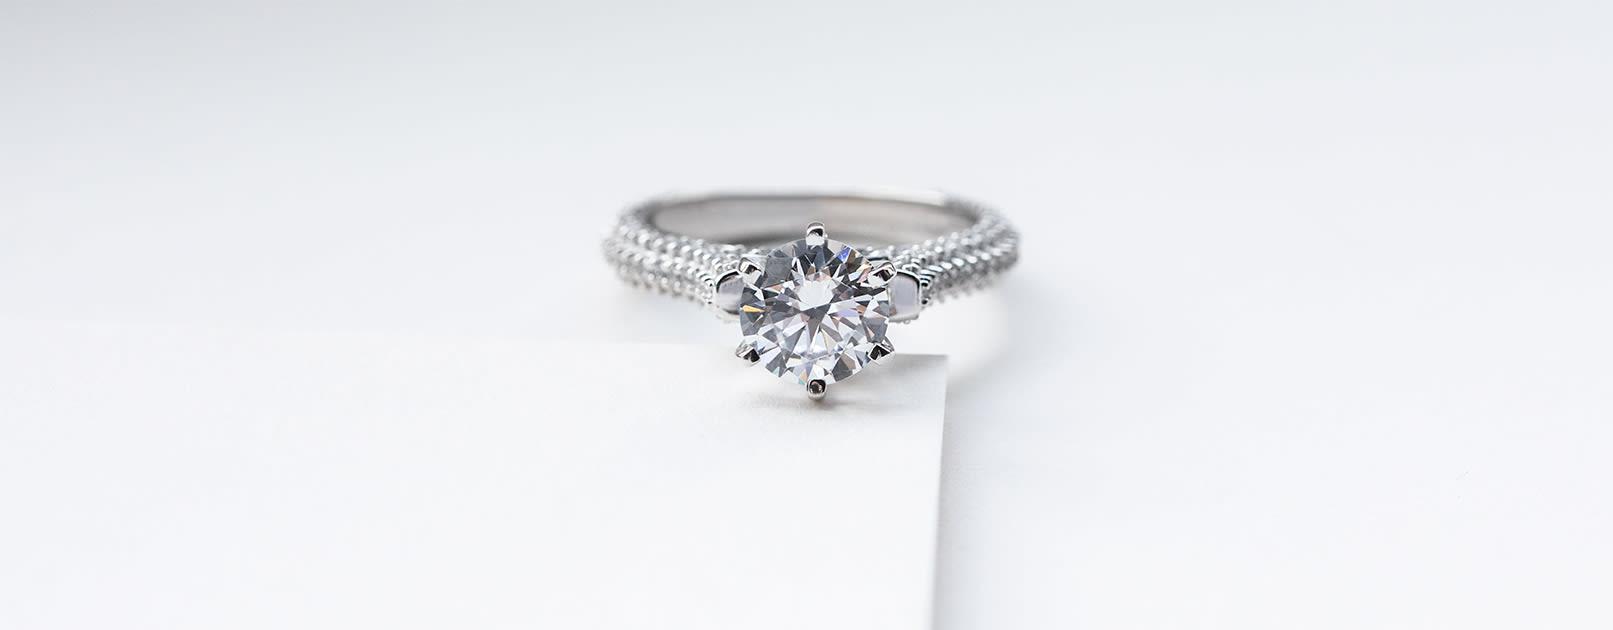 Seine Round Cut Engagement Ring from Diamond Nexus.